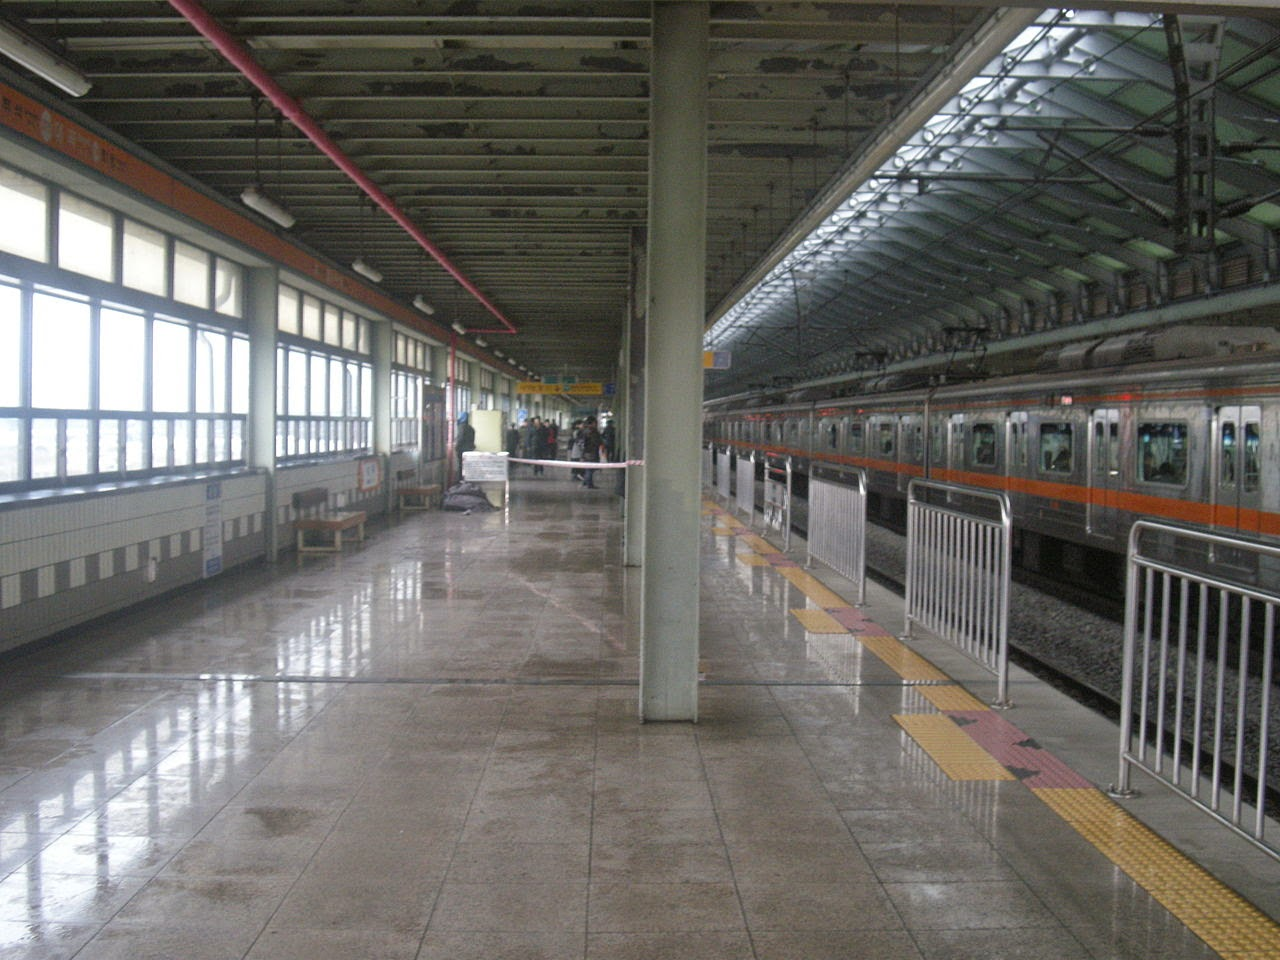 Photo: 일산선 대곡역 대화 방면 승강장 イルサン(一山)線テゴク(大谷)駅テファ(大化)方面ホーム By 주행거리계 via Wikimedia Commons (CC BY-SA 3.0) http://commons.wikimedia.org/wiki/File:315_Daegok_Station_Platform_for_Daehwa.JPG?uselang=ja  ★画像使用記事 『グリーンフィッシュ』 http://inagara.octsky.net/green-fish